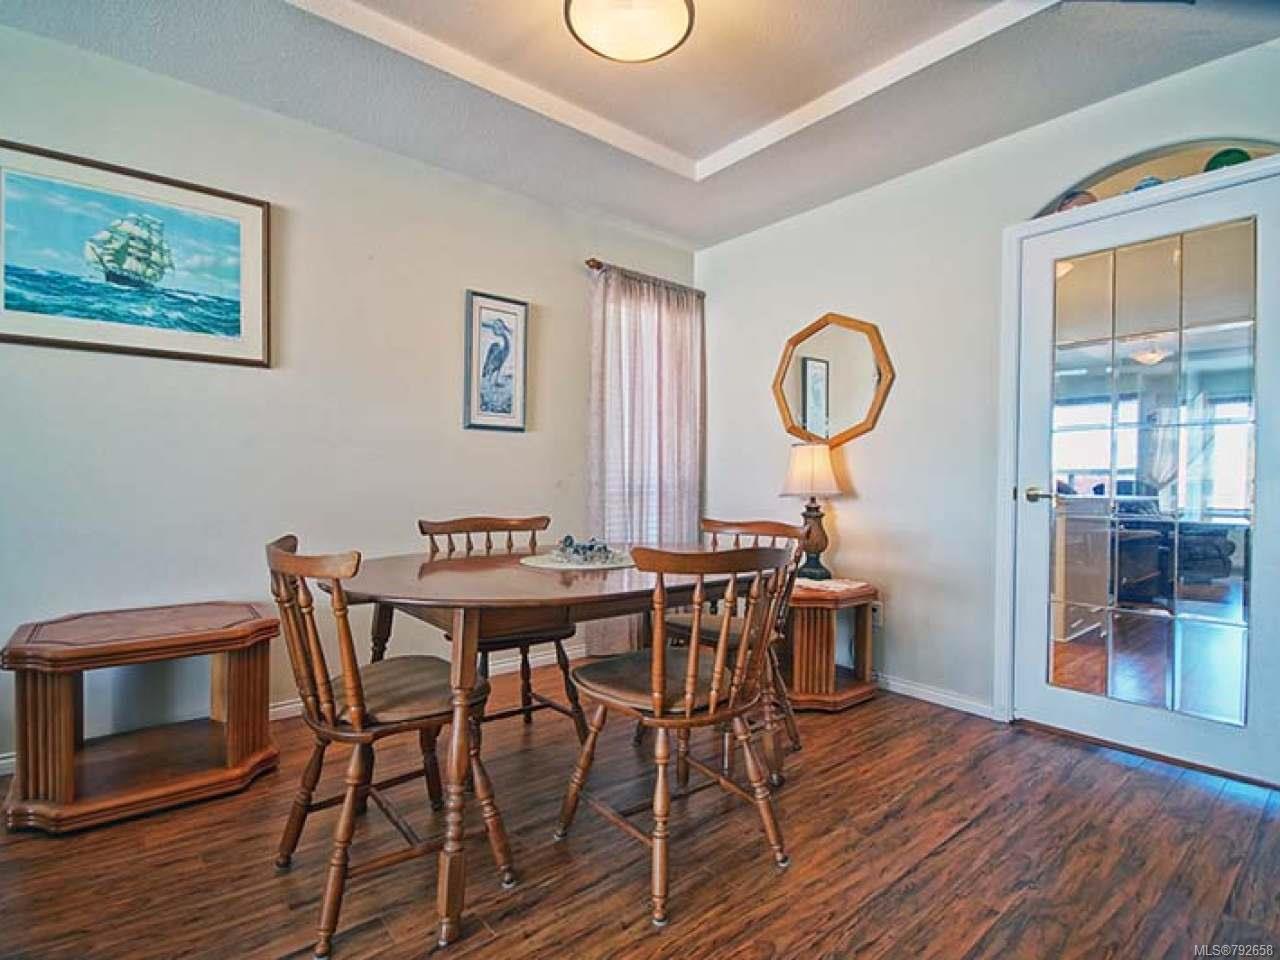 Photo 4: Photos: 893 EDGEWARE Avenue in PARKSVILLE: PQ Parksville House for sale (Parksville/Qualicum)  : MLS®# 792658